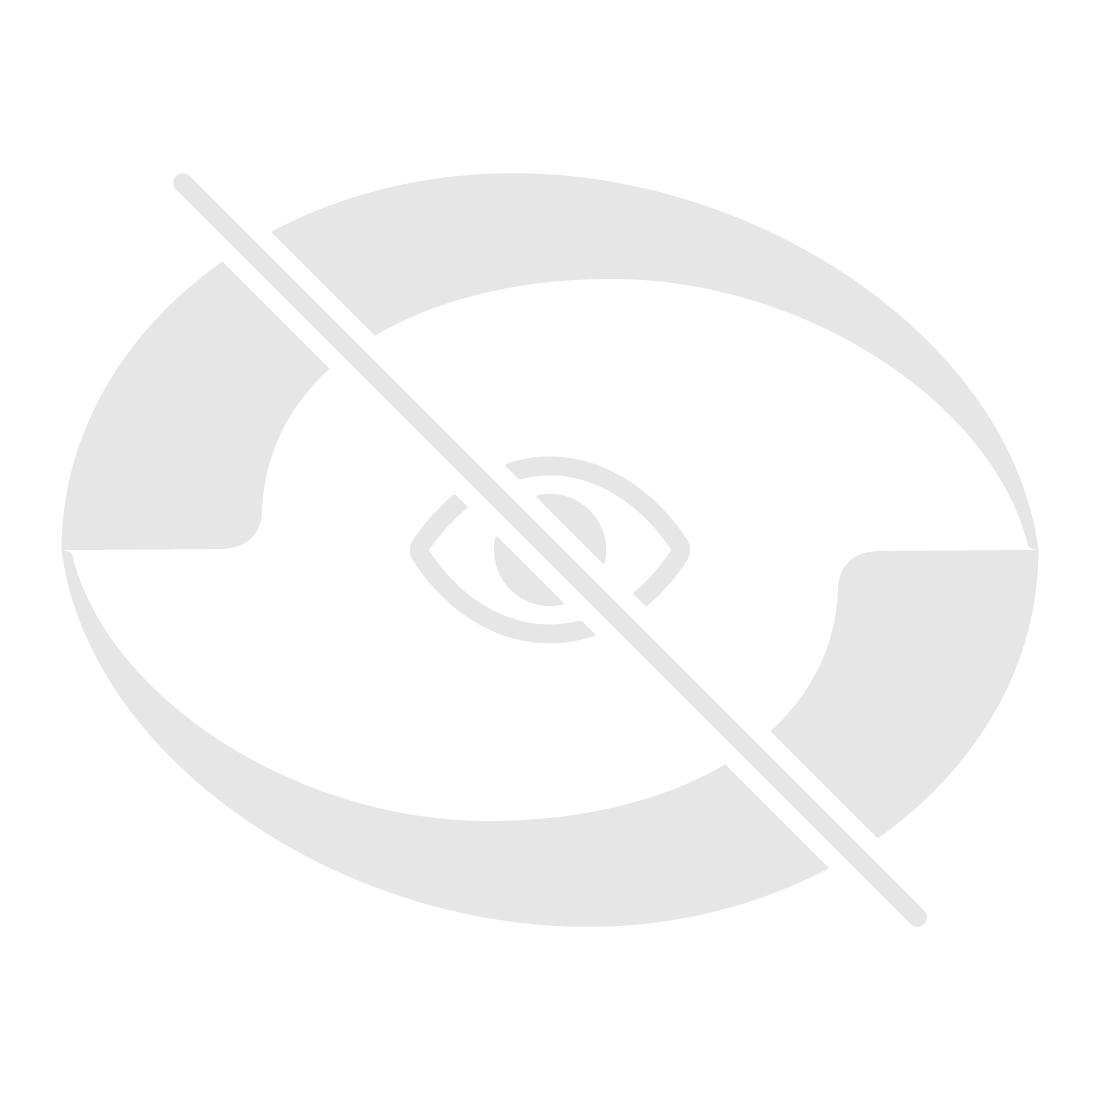 GeoVision GV-1120B-16 + GV-CB120 • 16 channel hybrid video capture card + IP camera GV-CB120